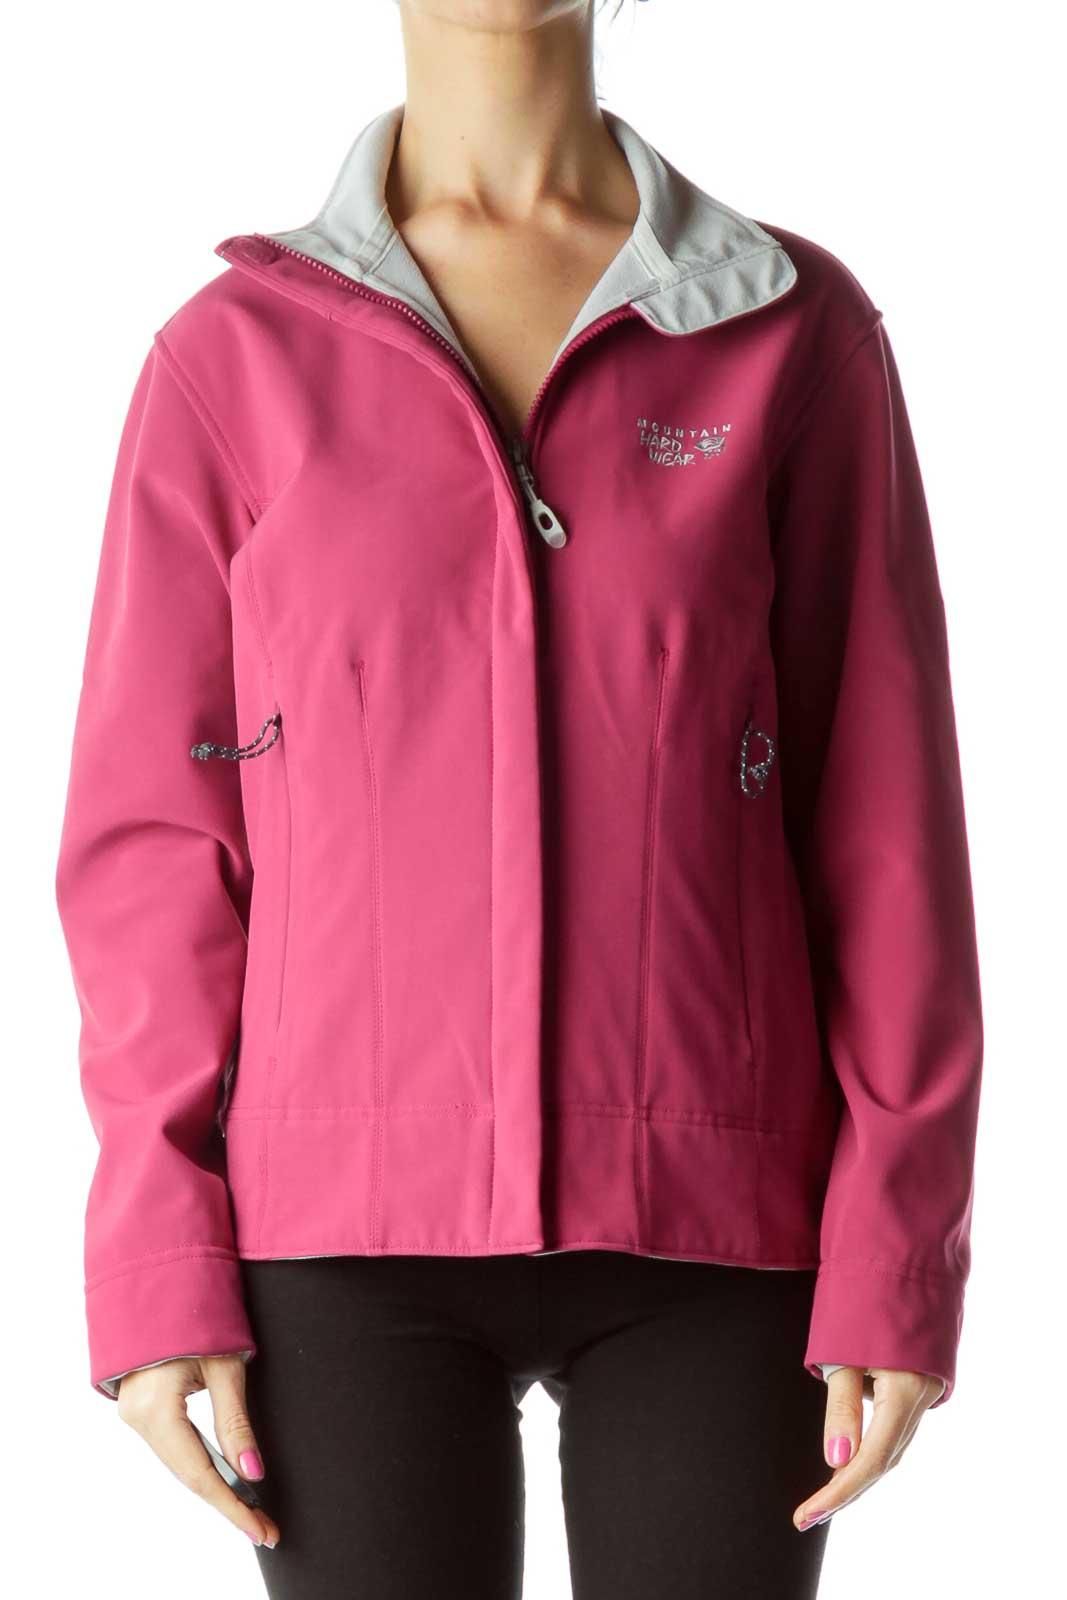 Purple Gray Outerwear Jacket Front